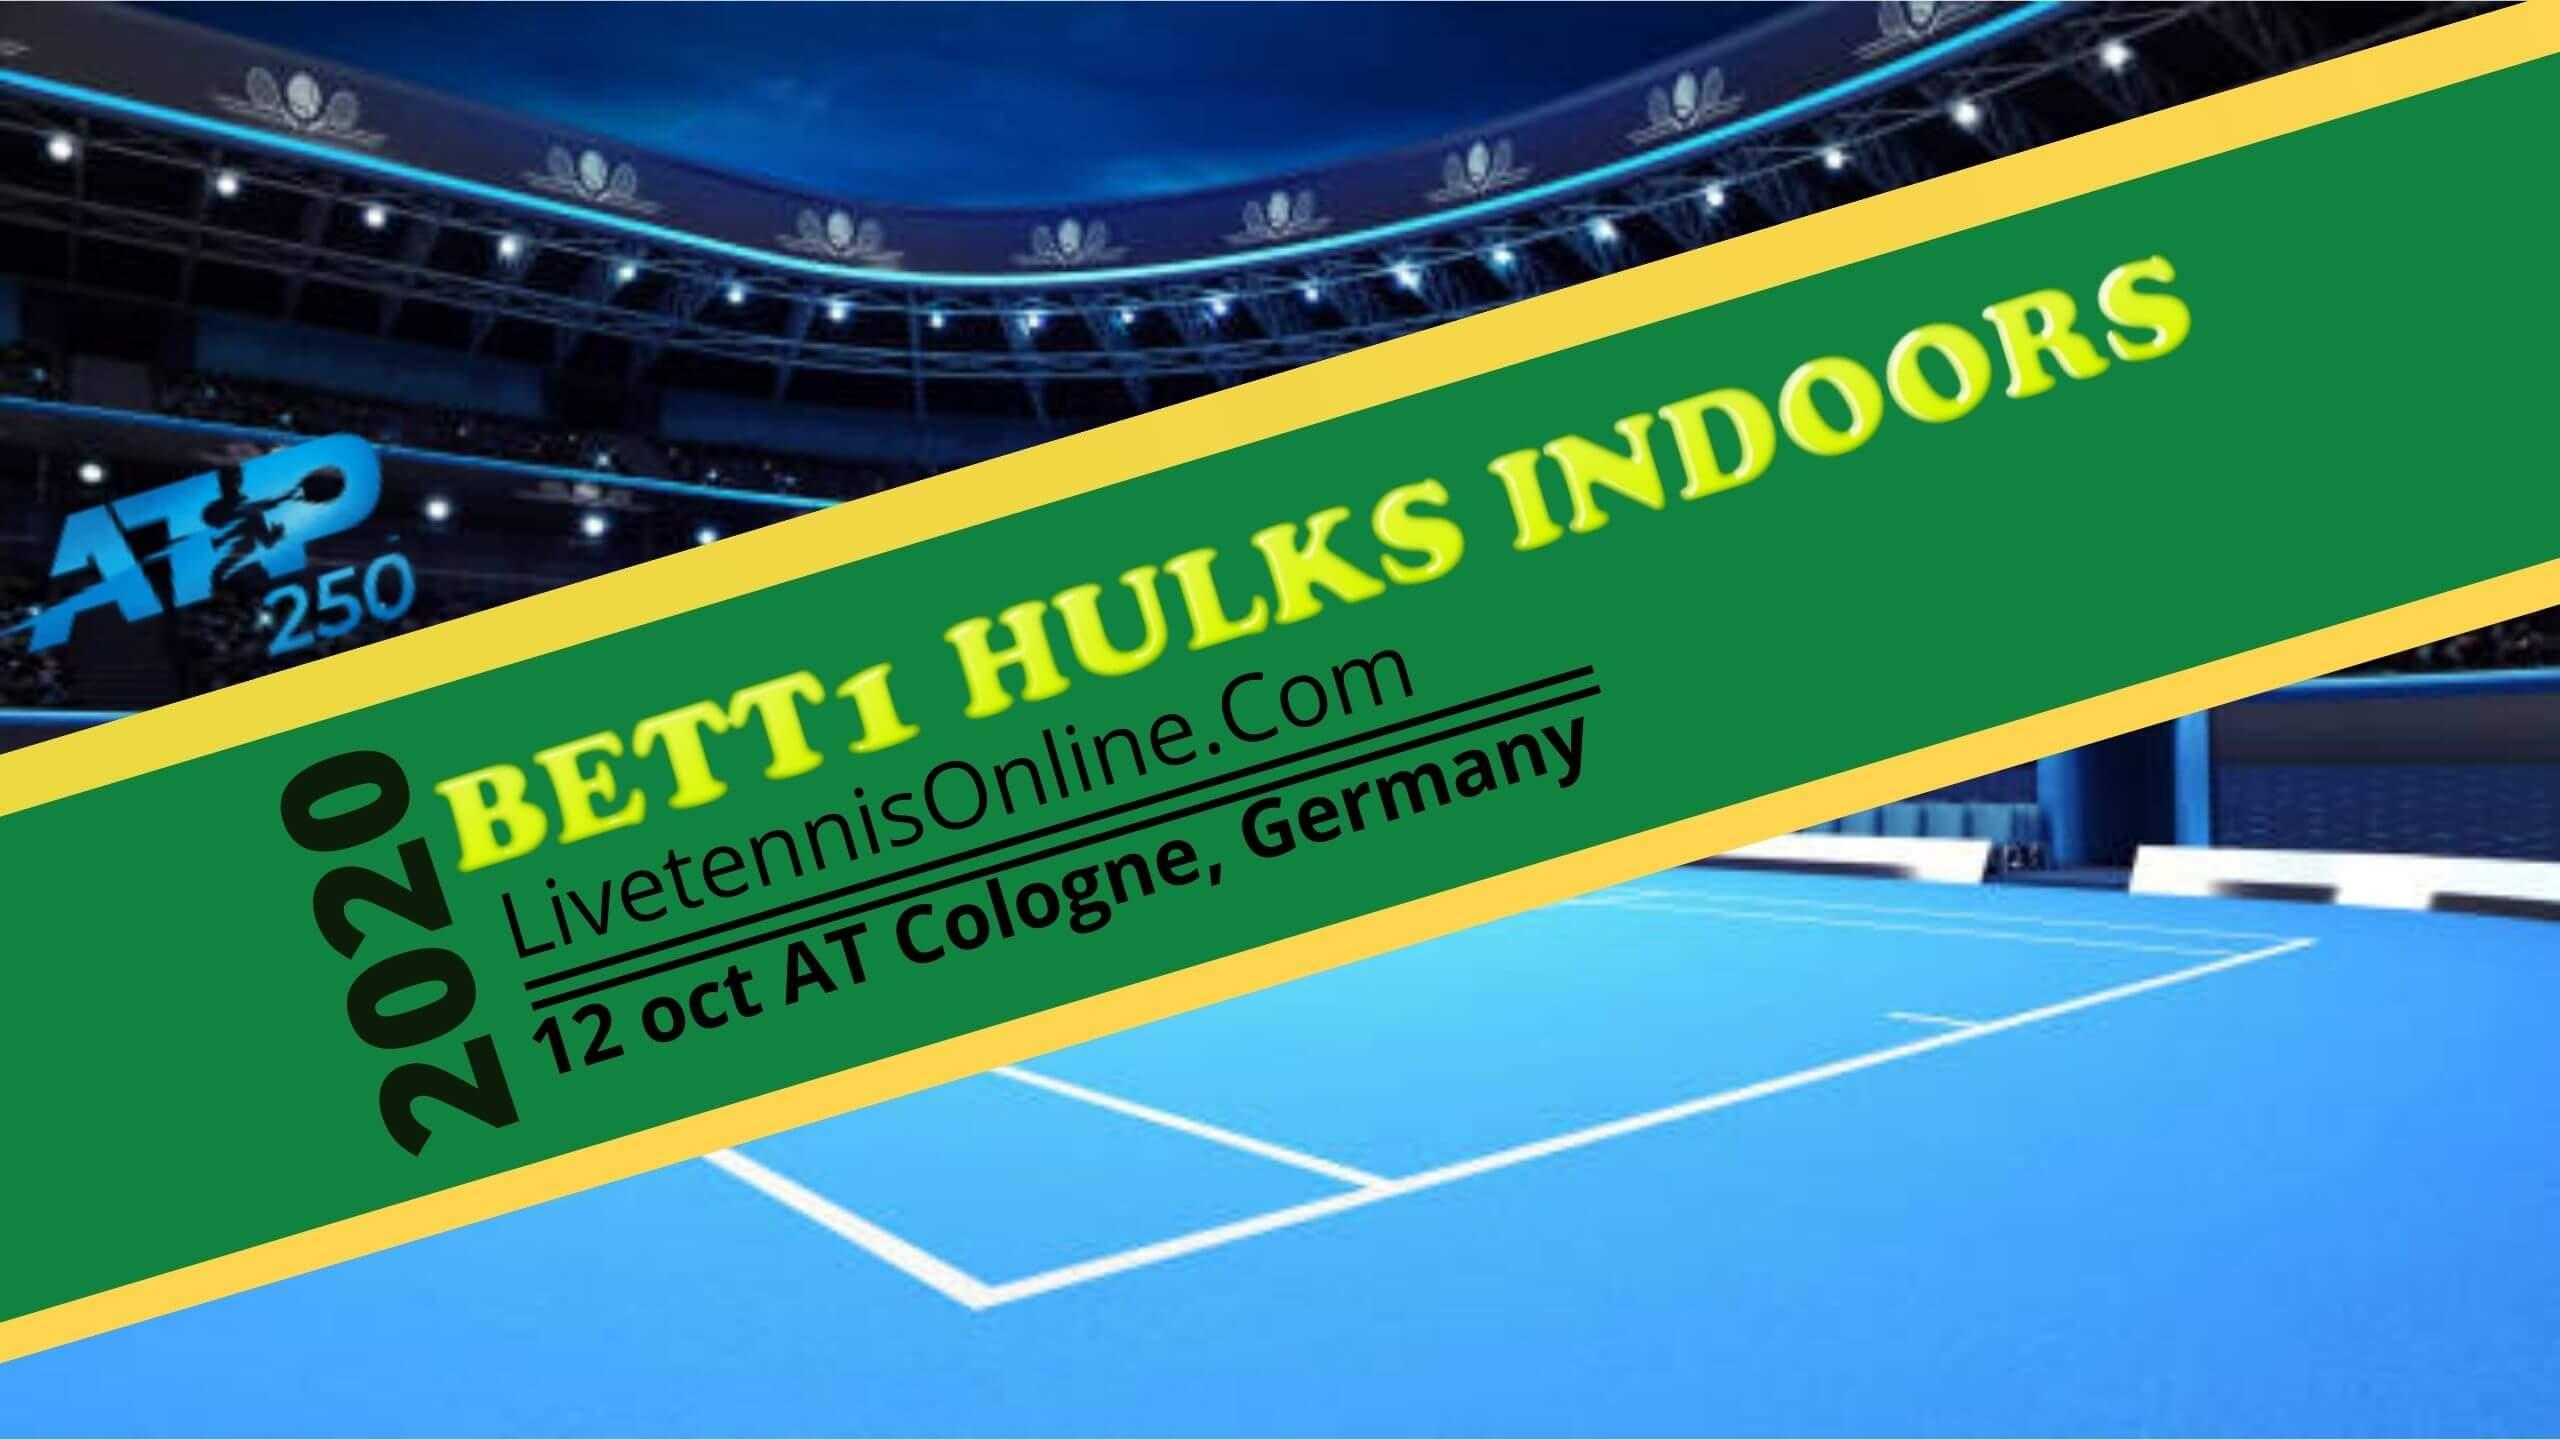 bett1hulks-indoors-live